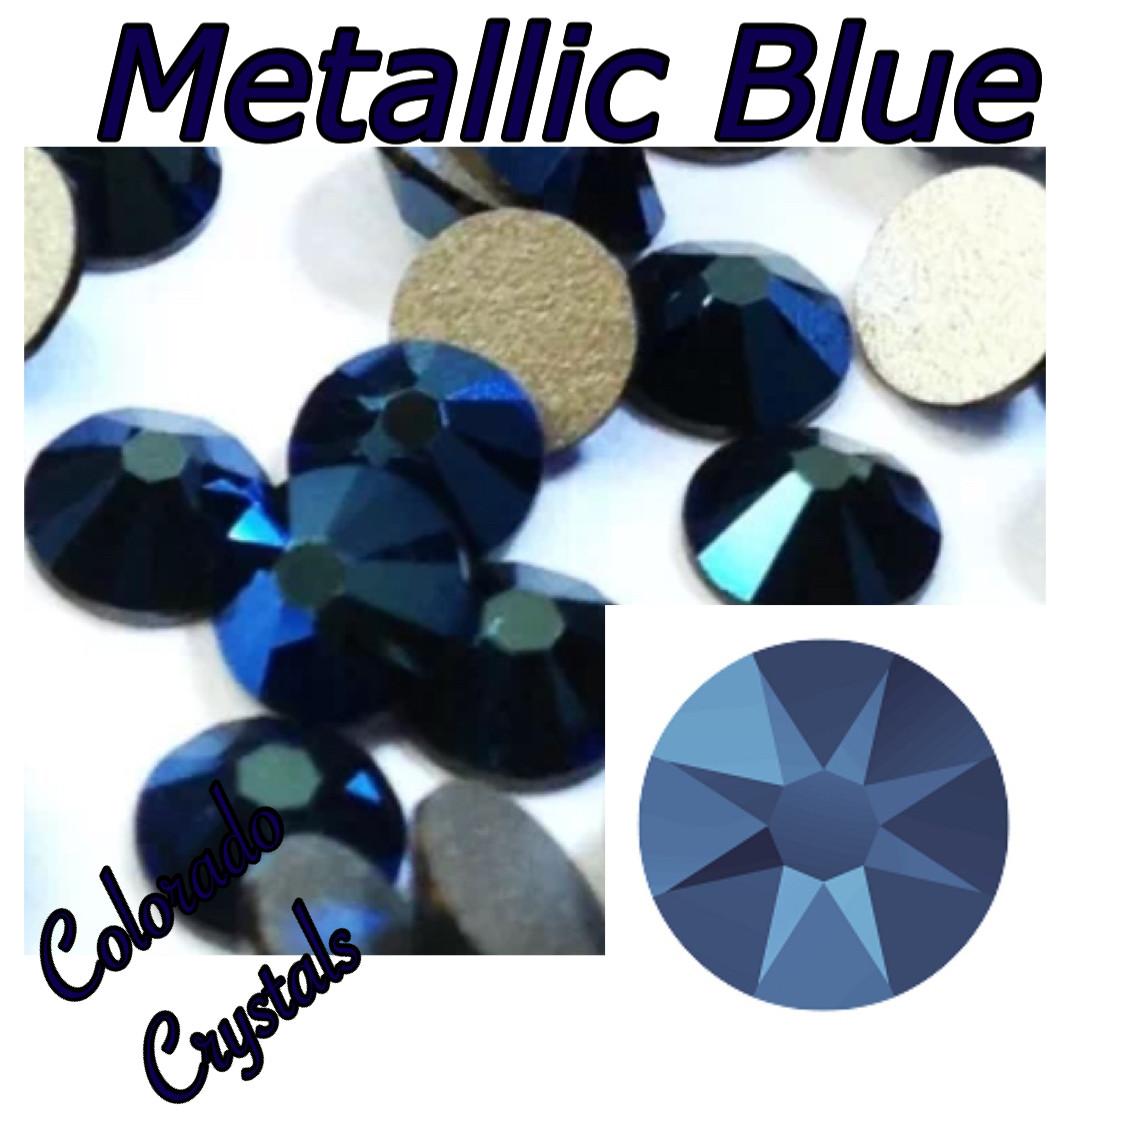 Metallic Blue (Crystal) 12ss 2088 Limited Swarovski